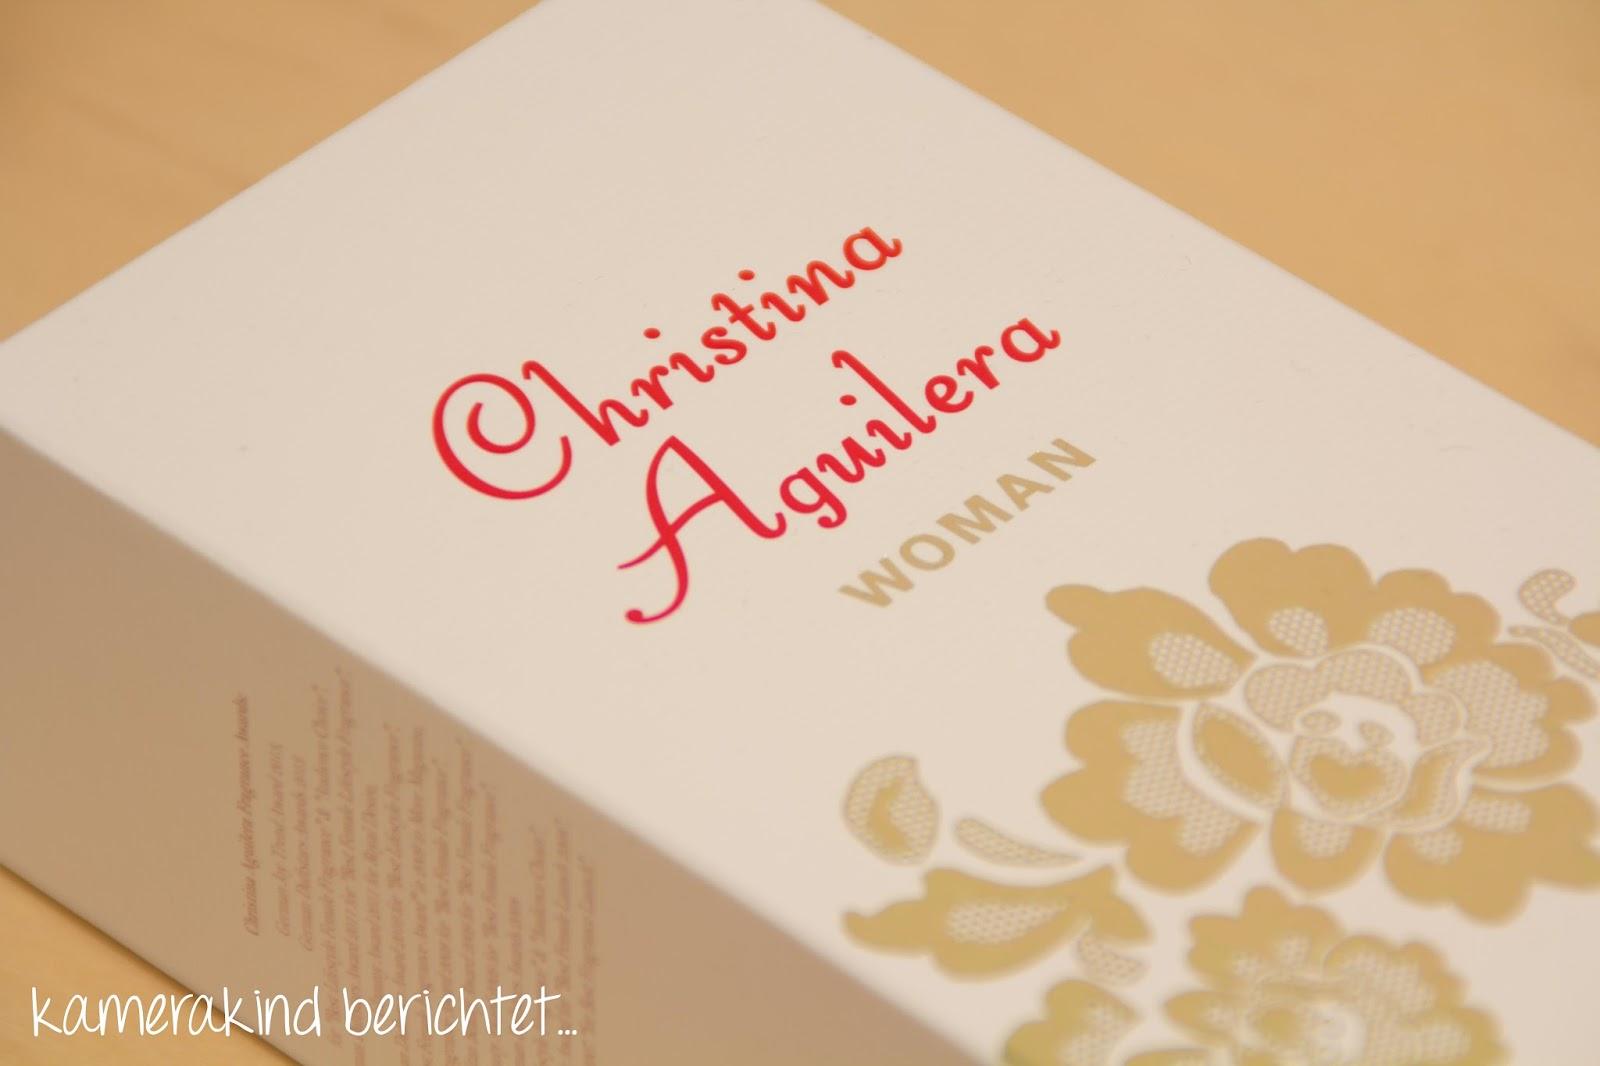 Verpackung Christina Aguilera Parfum Woman